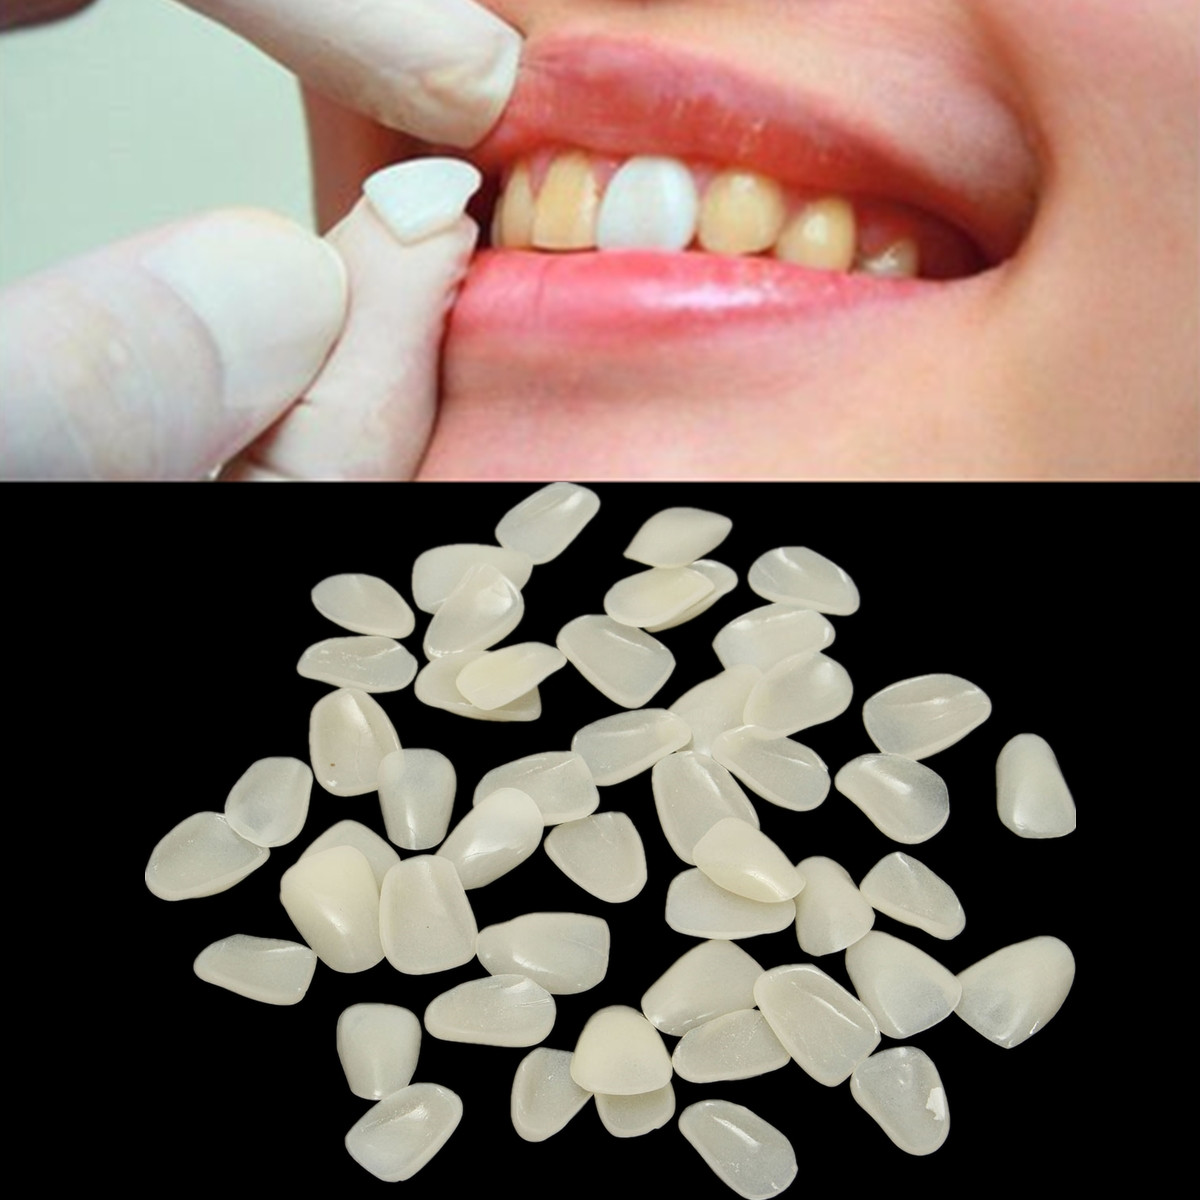 3x50pcs Dental Ultra Thin Whitening Porcelain Teeth